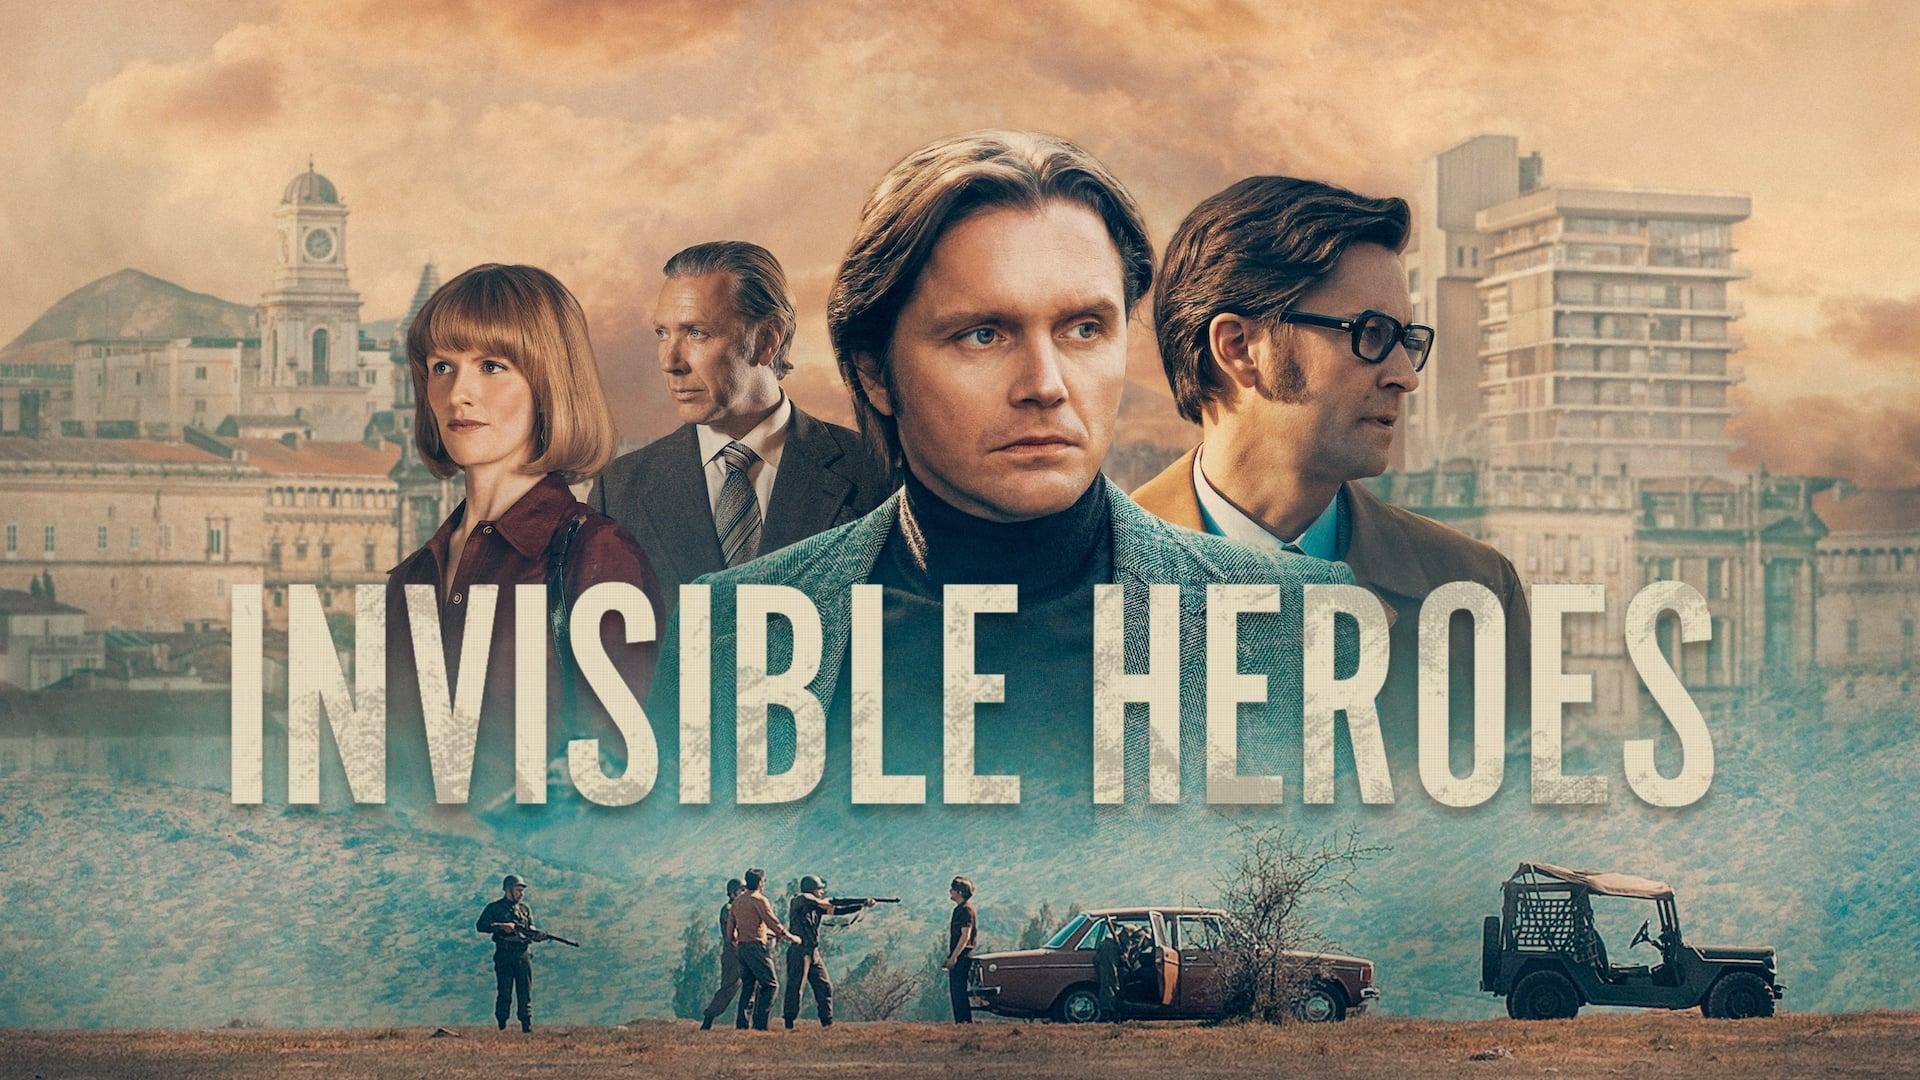 Maak kans op de miniserie Invisible Heroes